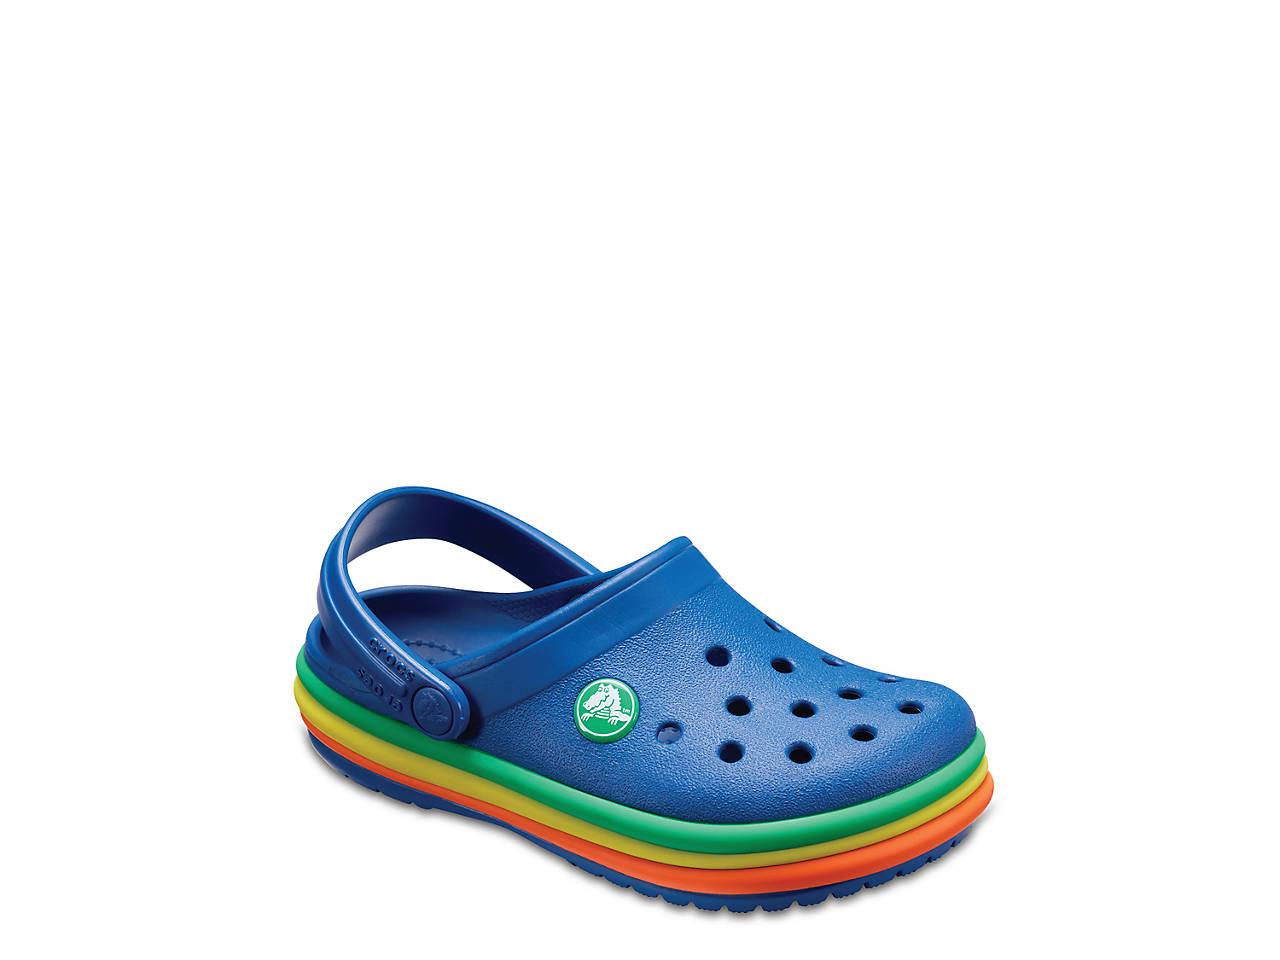 e6c6ea2aa49a4f Crocs Rainbow Band Toddler   Youth Clog Kids Shoes